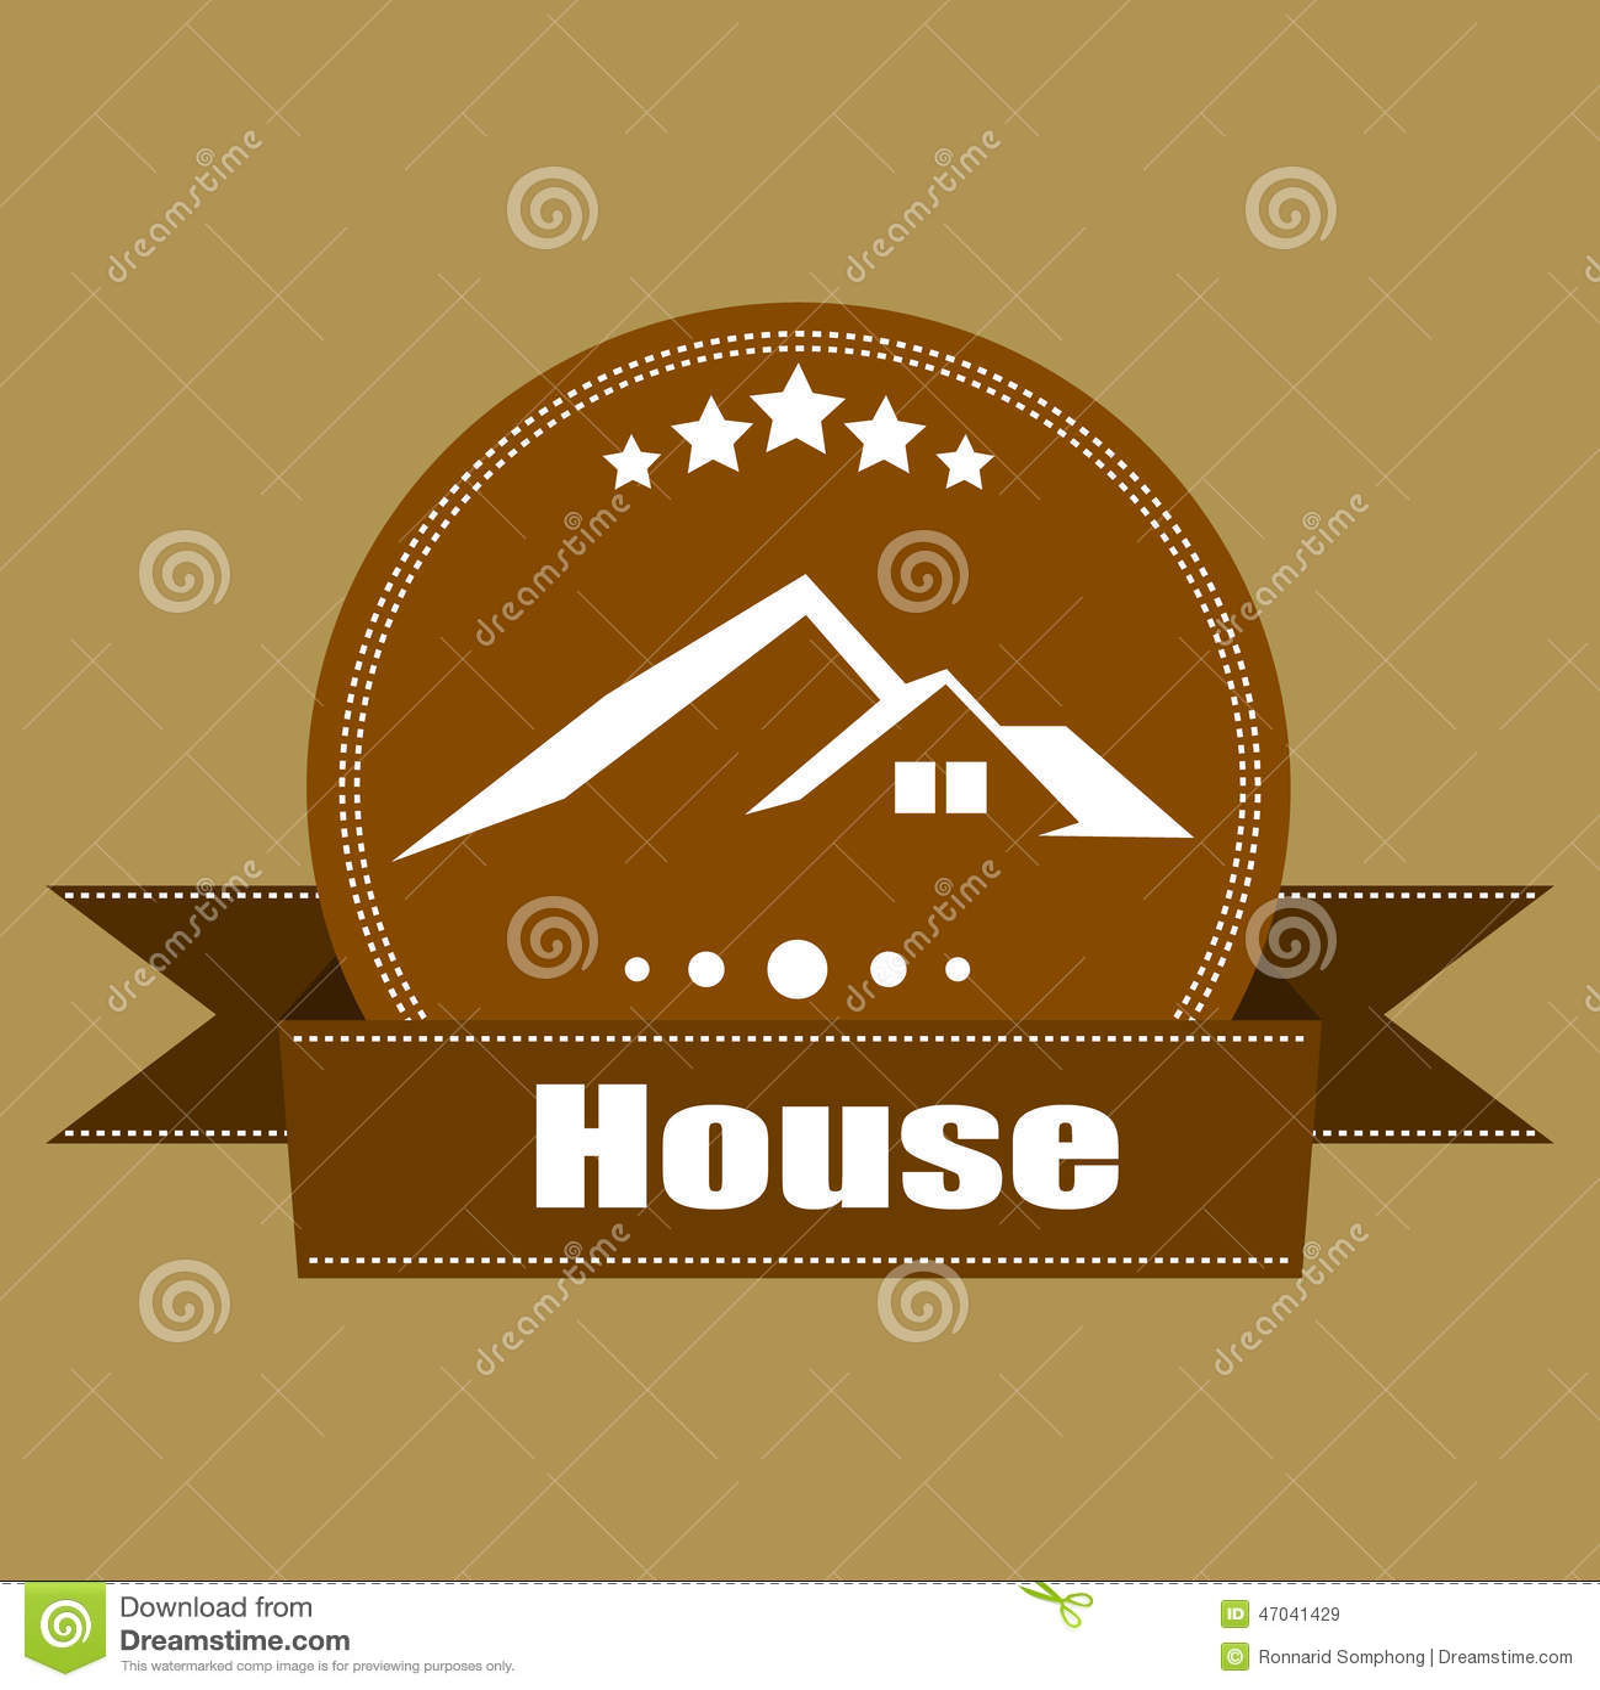 House real estate retro vintage logo labels design stock for Classic house labels